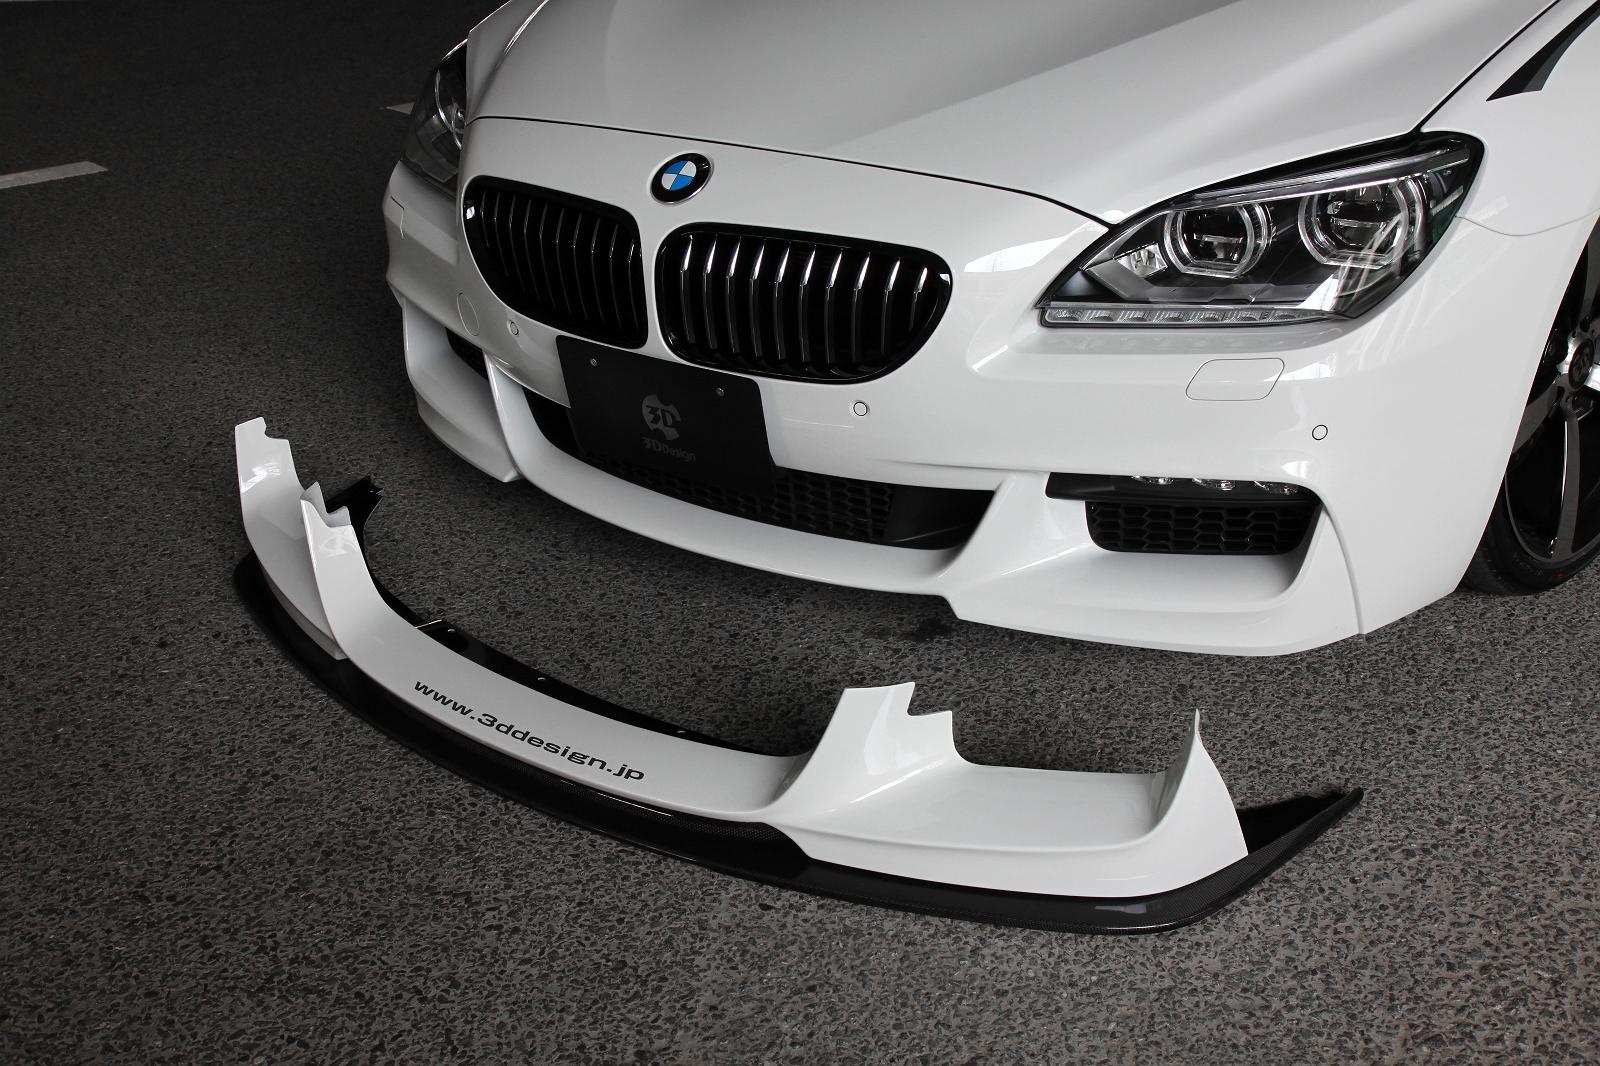 3d Design Presents The 6 Series Gran Coupe